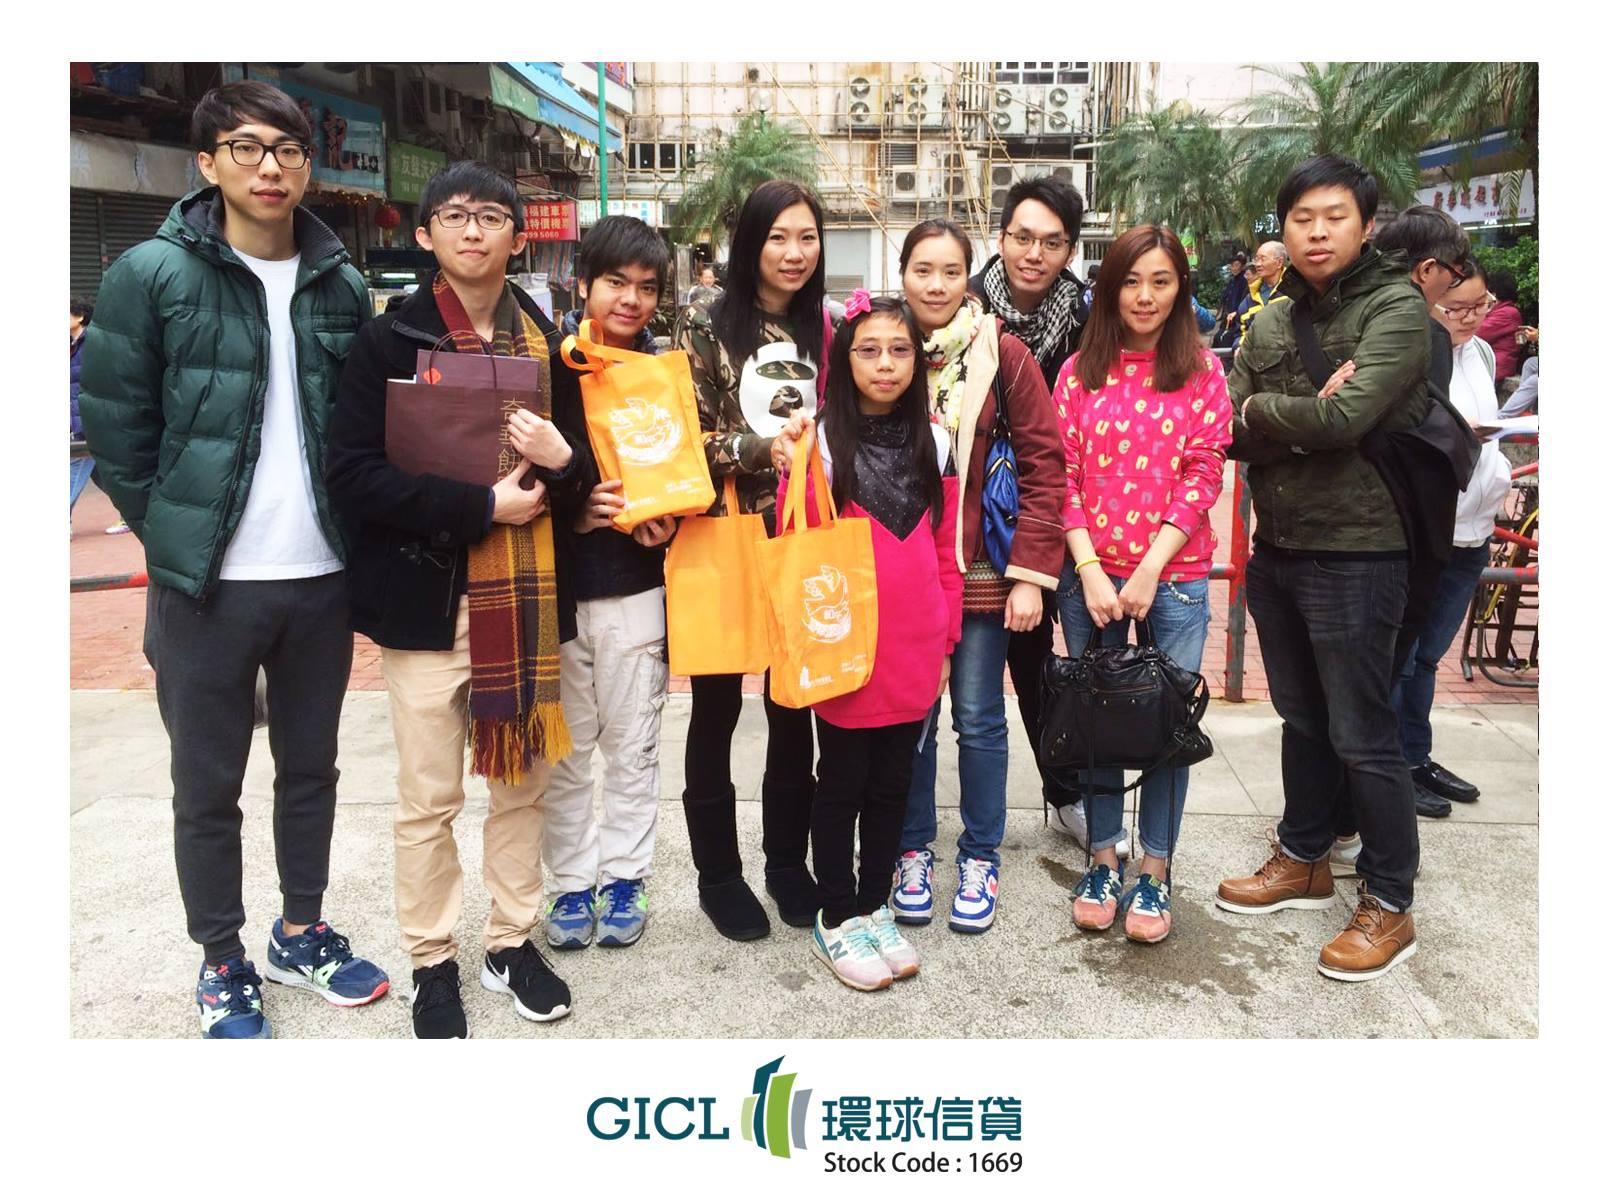 GICL X UPEF – HOME VISIT ACTIVITY IN TSUEN WAN 2016